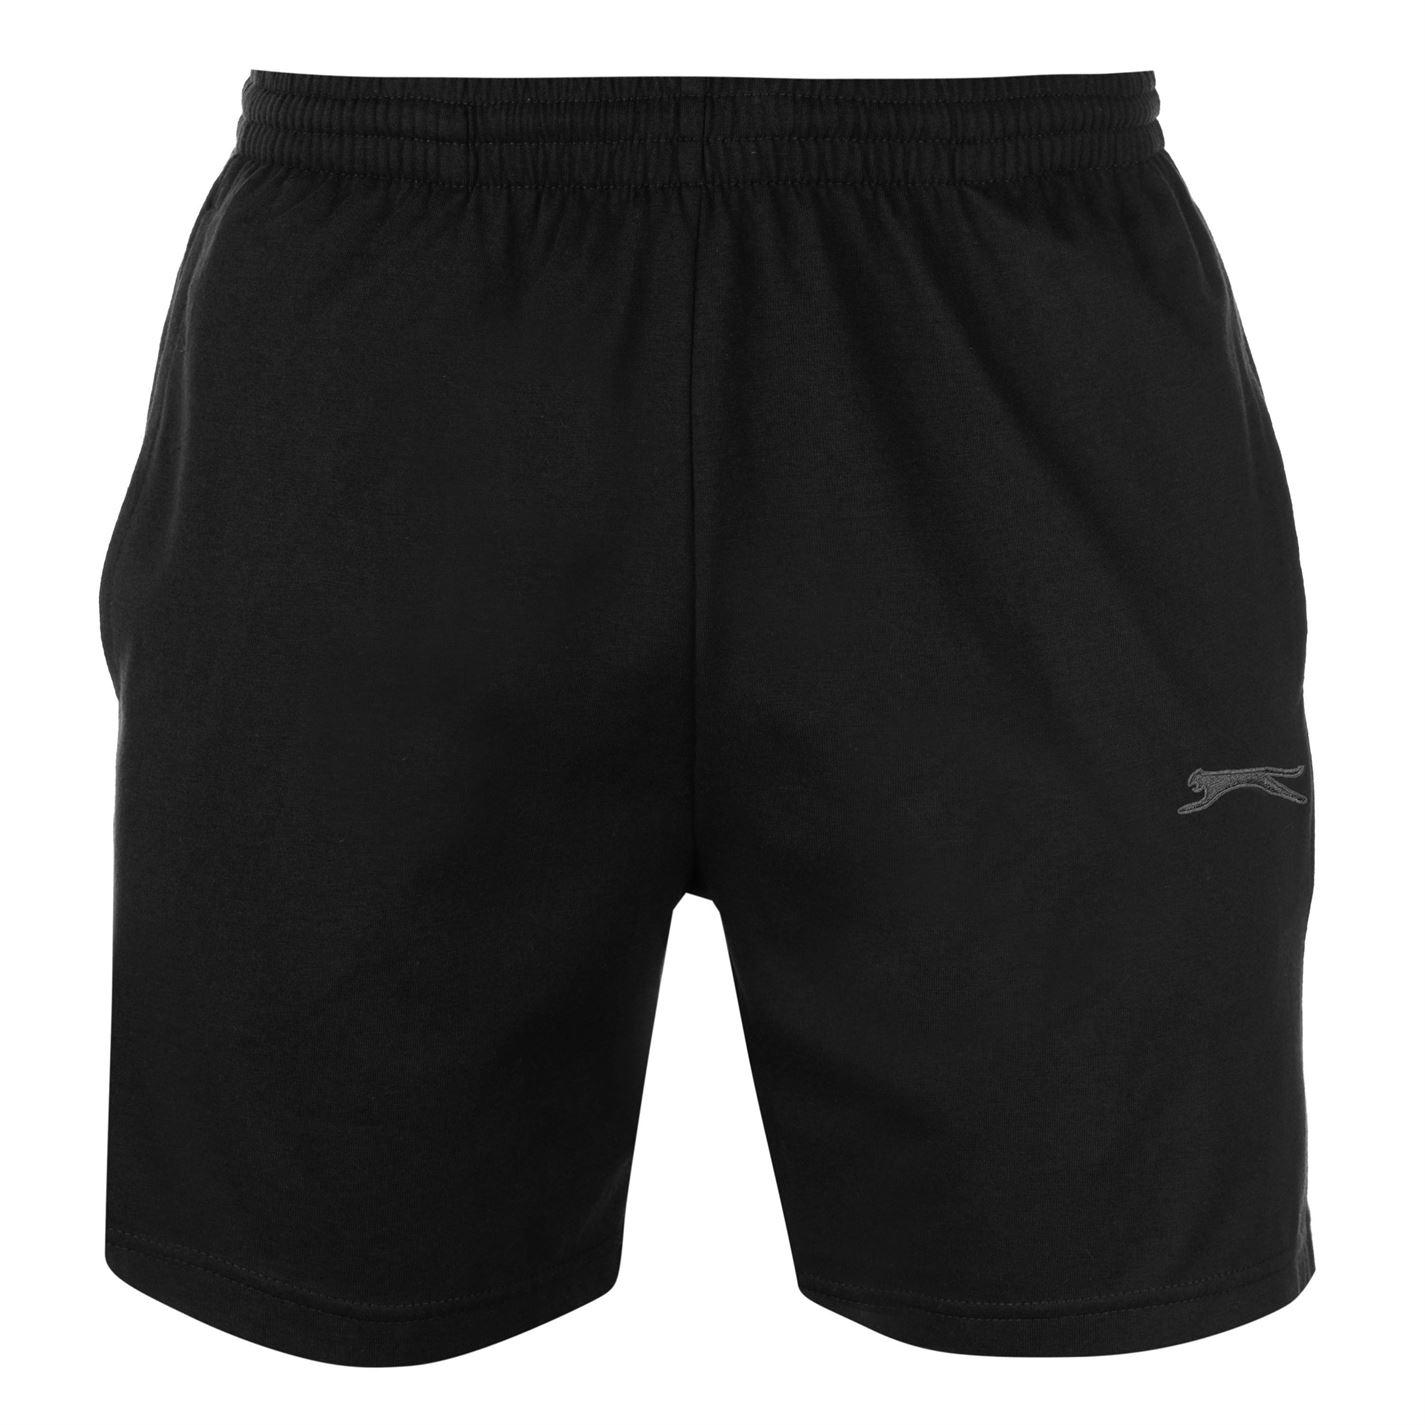 Pantaloni scurti Slazenger Jersey pentru Barbati negru